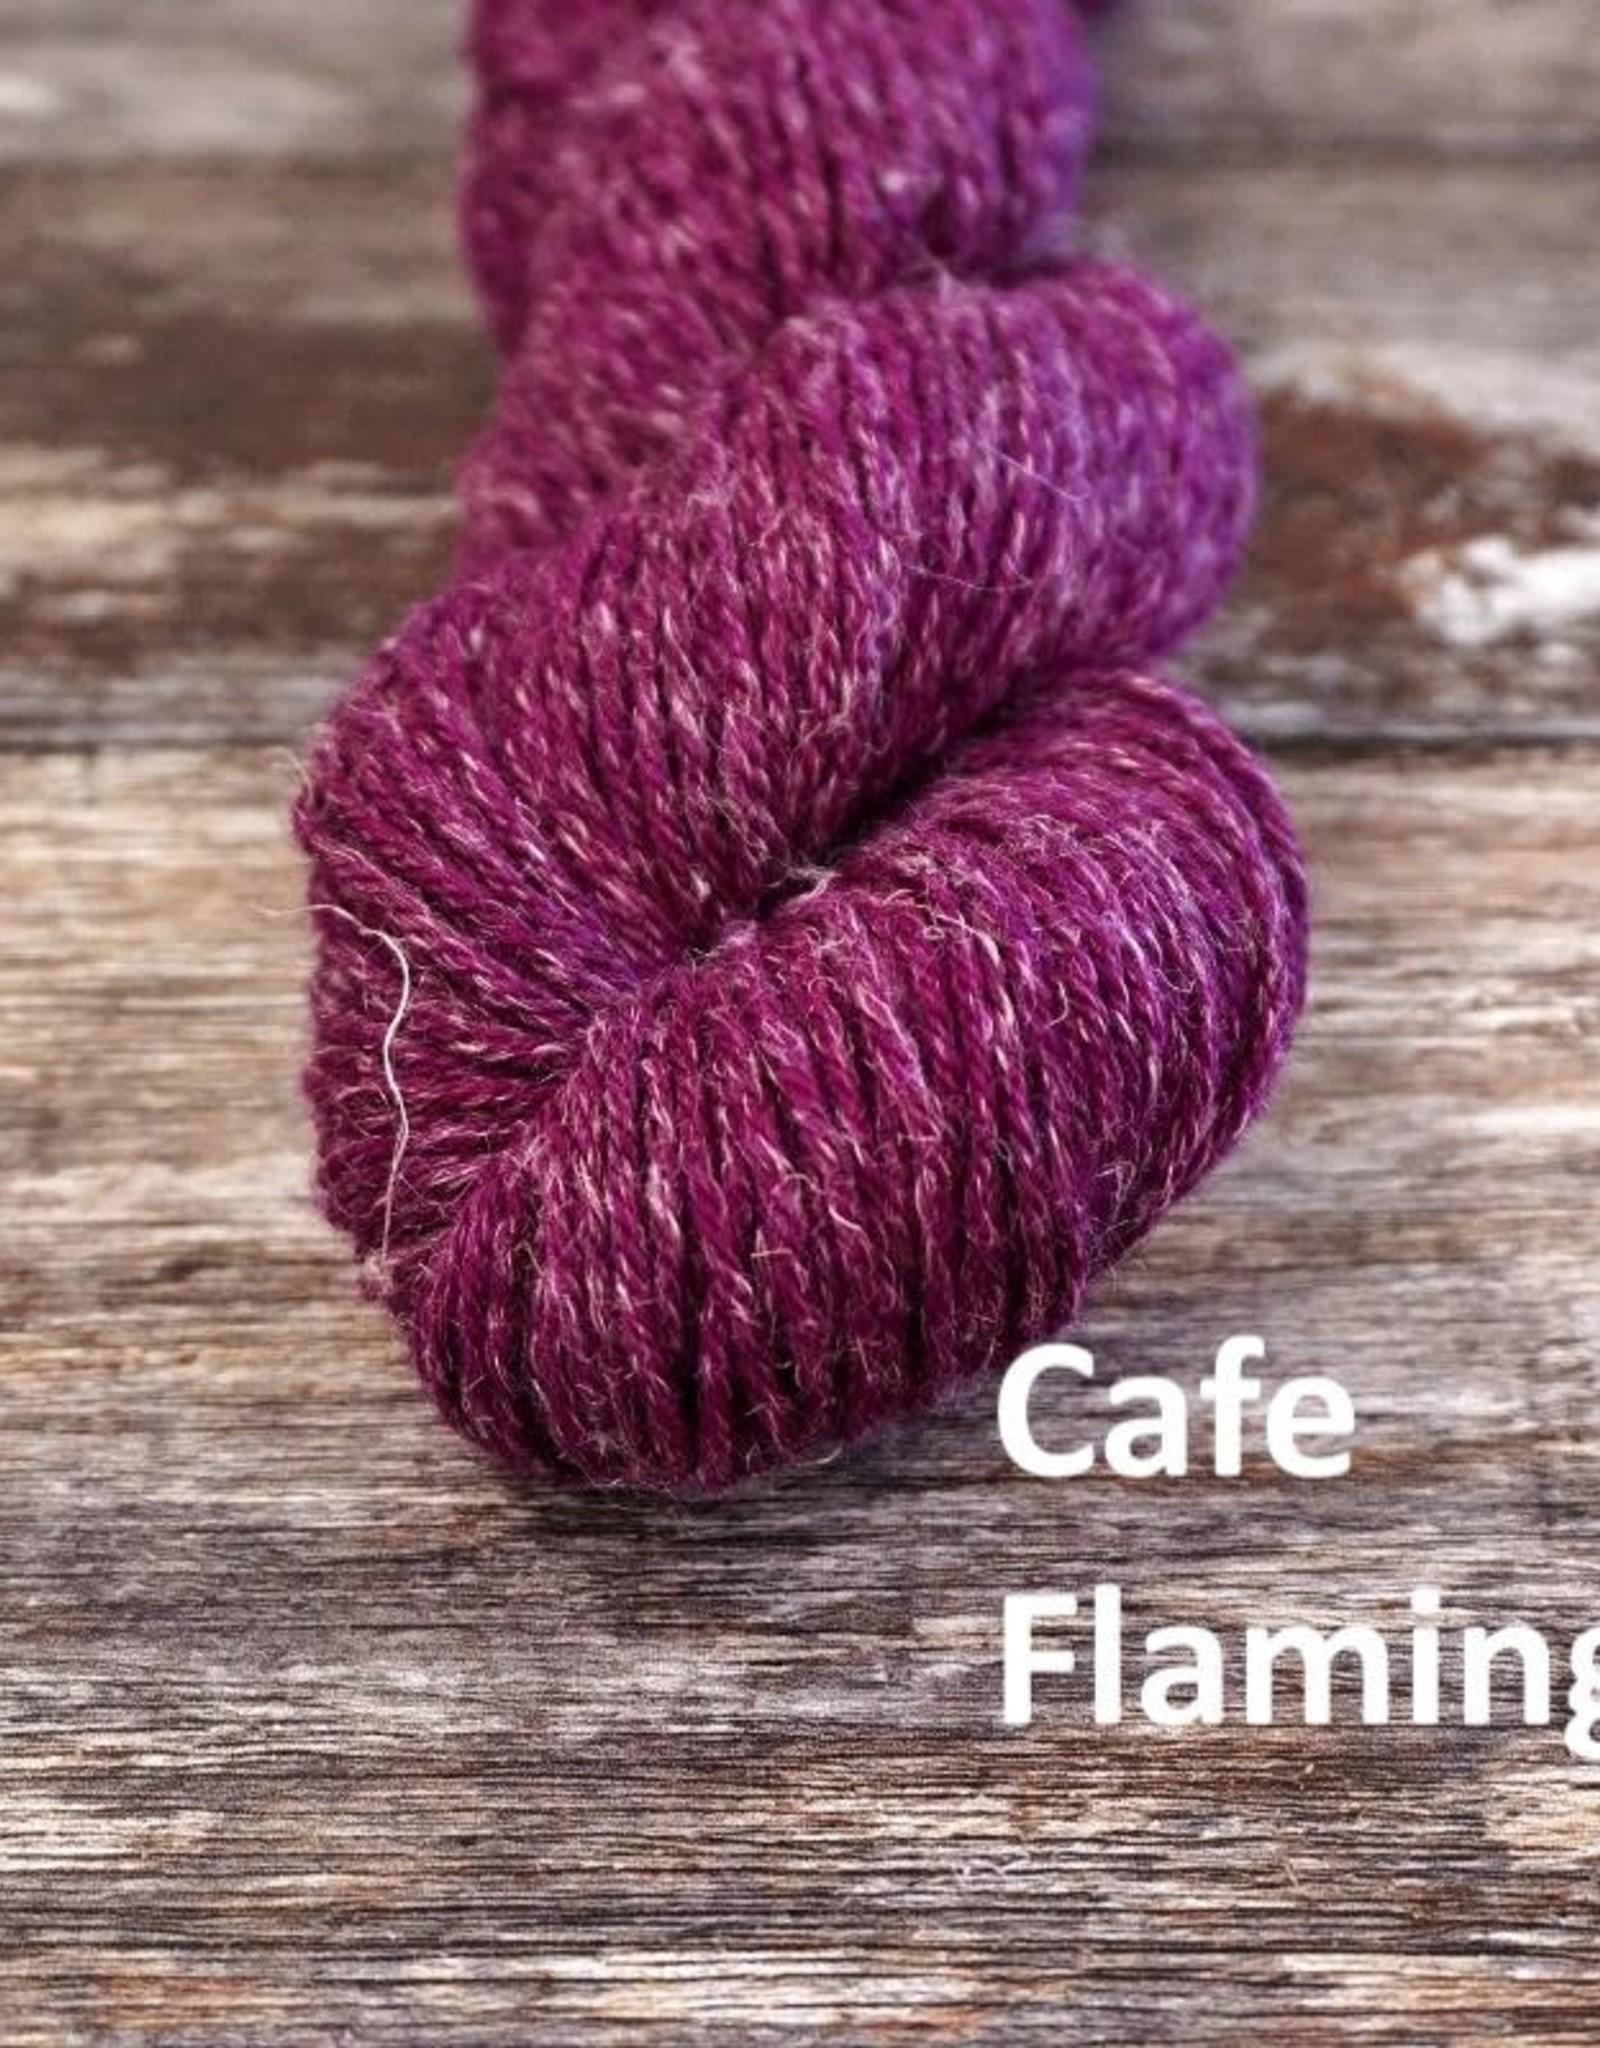 Nua - Cafe Flamingo 9812